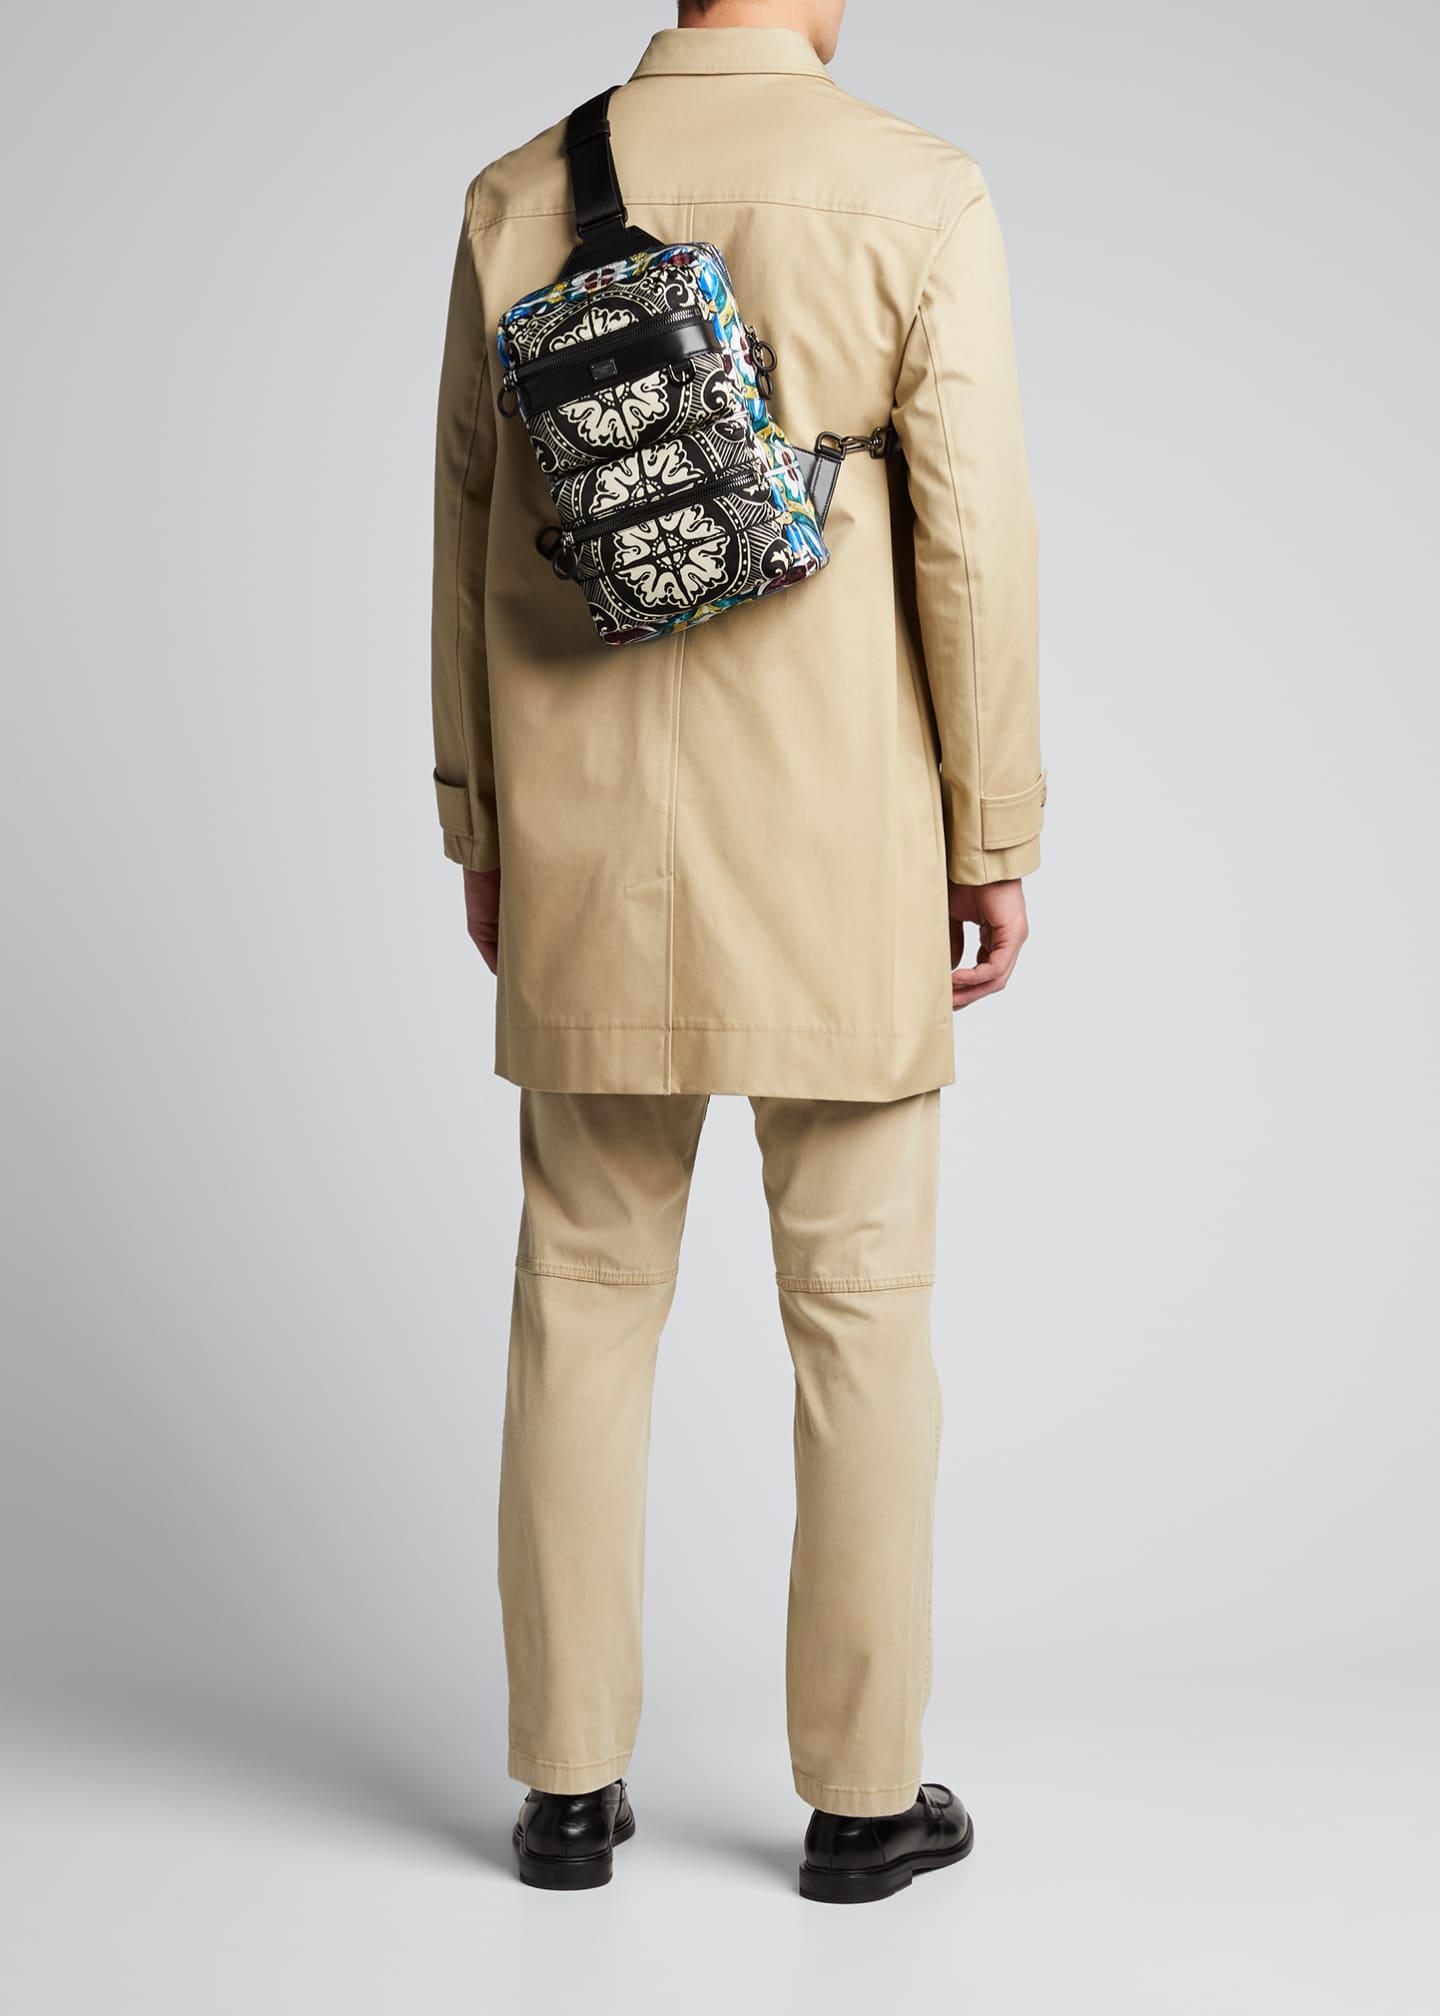 Dolce Amp Gabbana Men S Marsupio Majolica Fanny Pack Belt